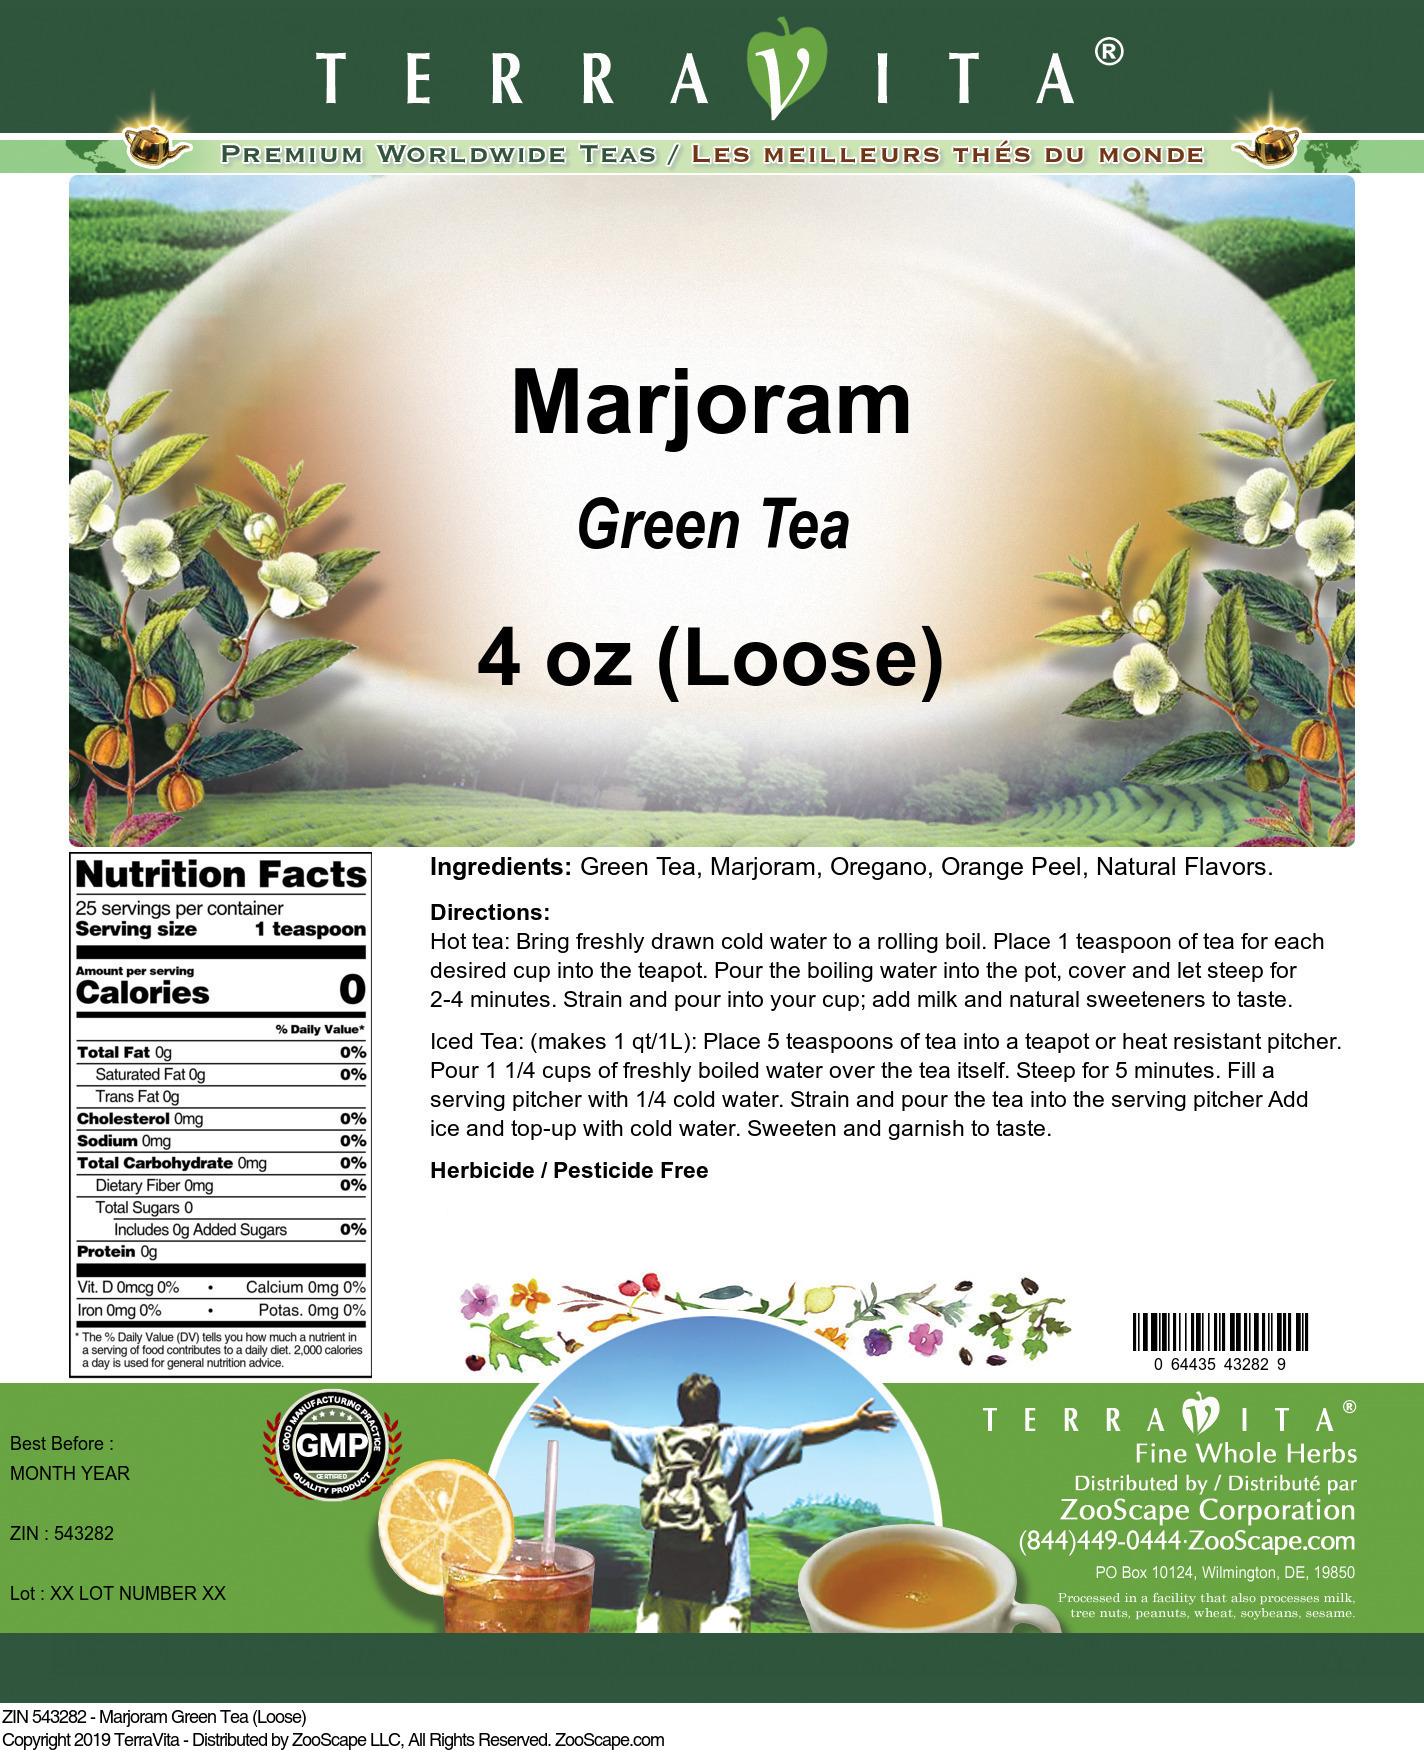 Marjoram Green Tea (Loose)